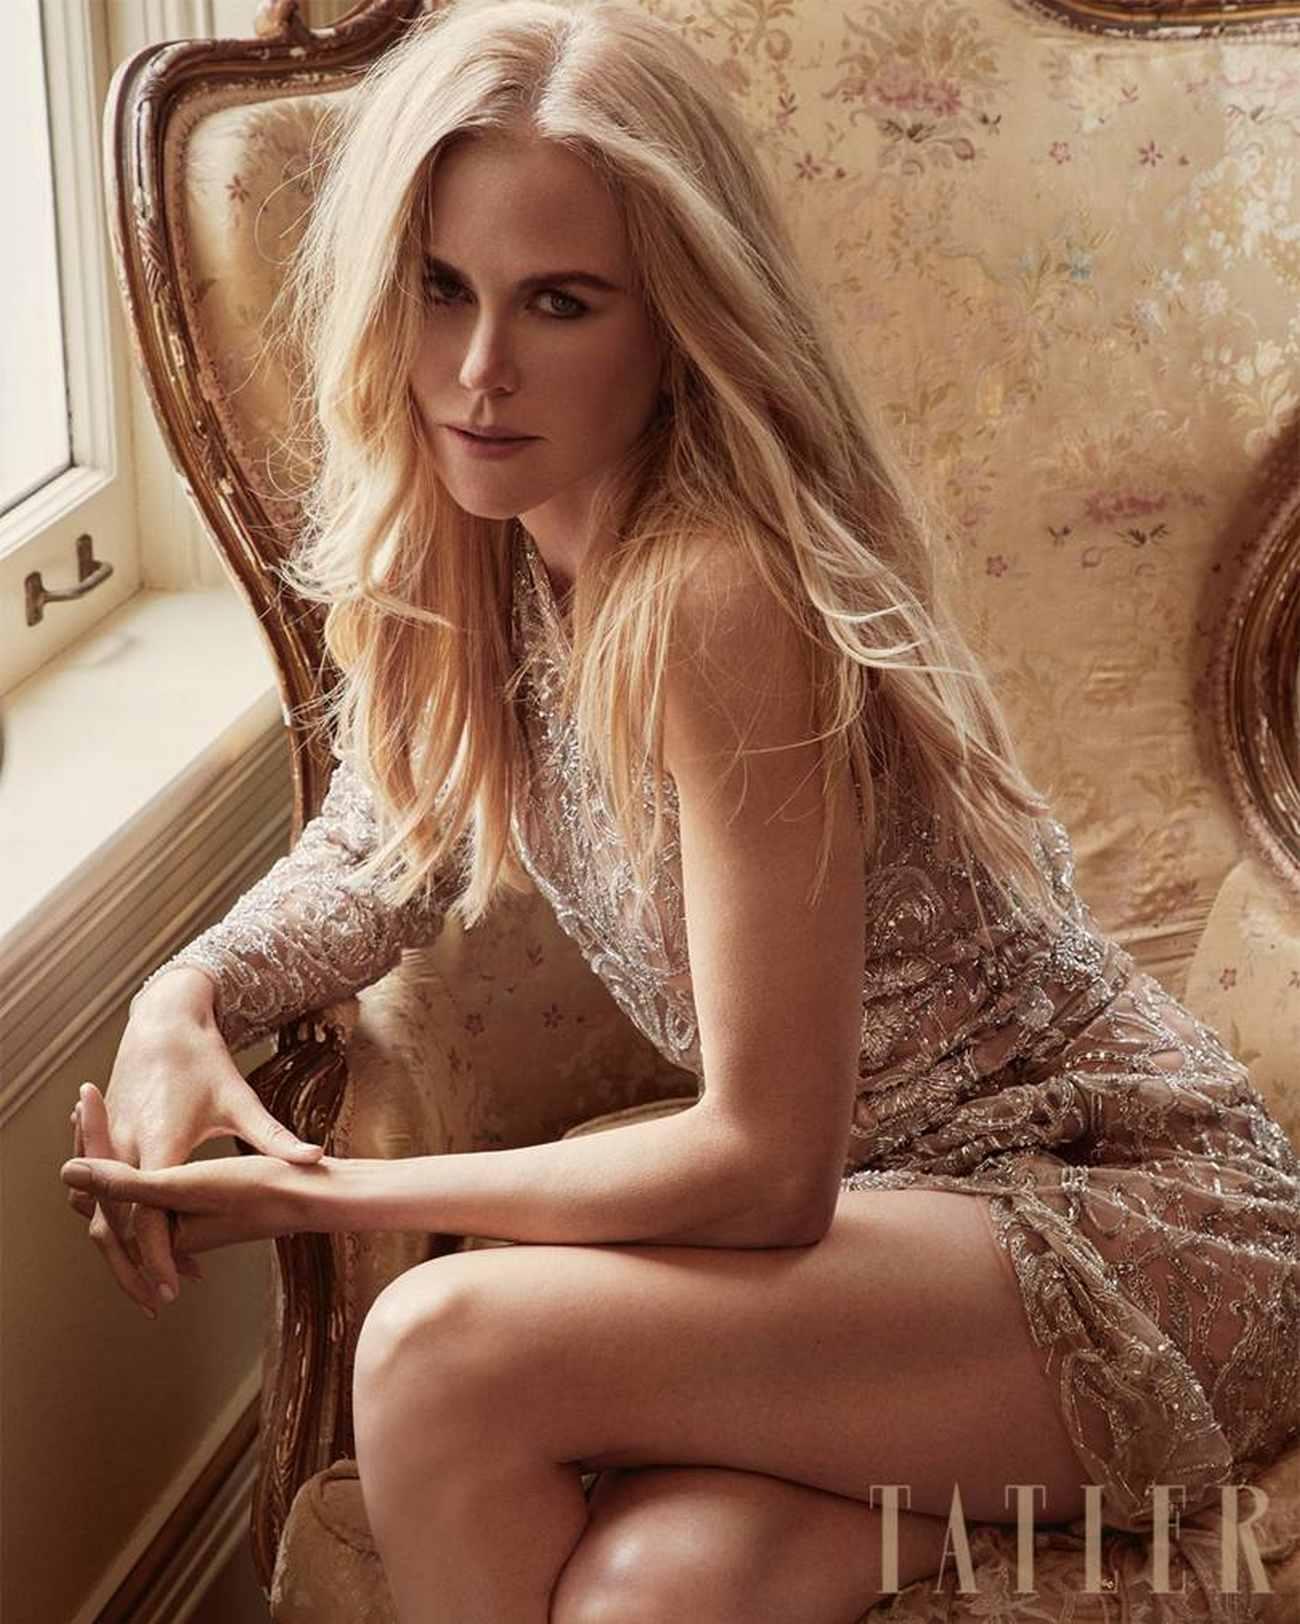 Nicole-Kidman-Tatler-July-201800002.jpg